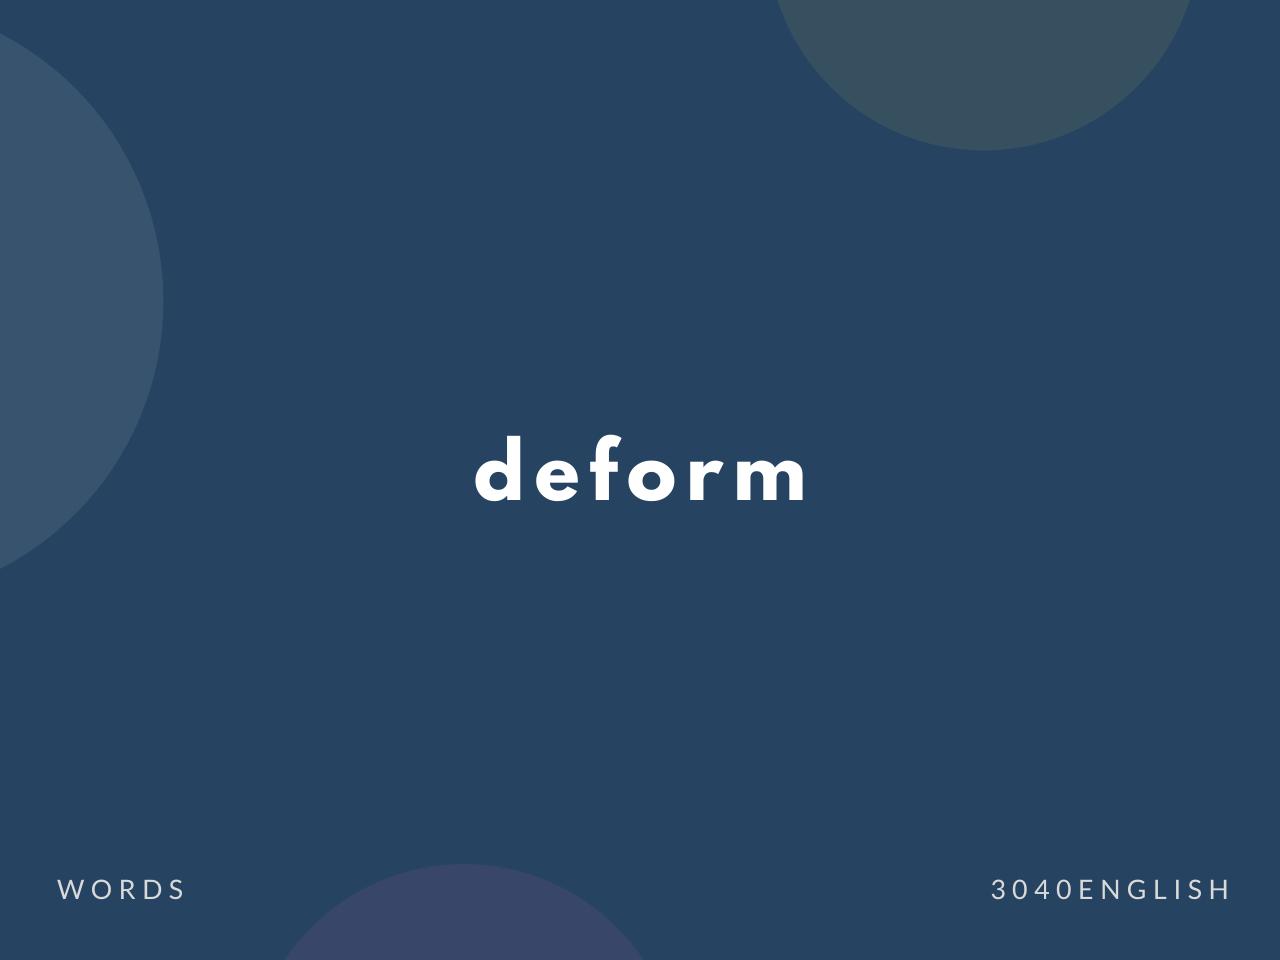 deform の意味と簡単な使い方【音読用例文あり】